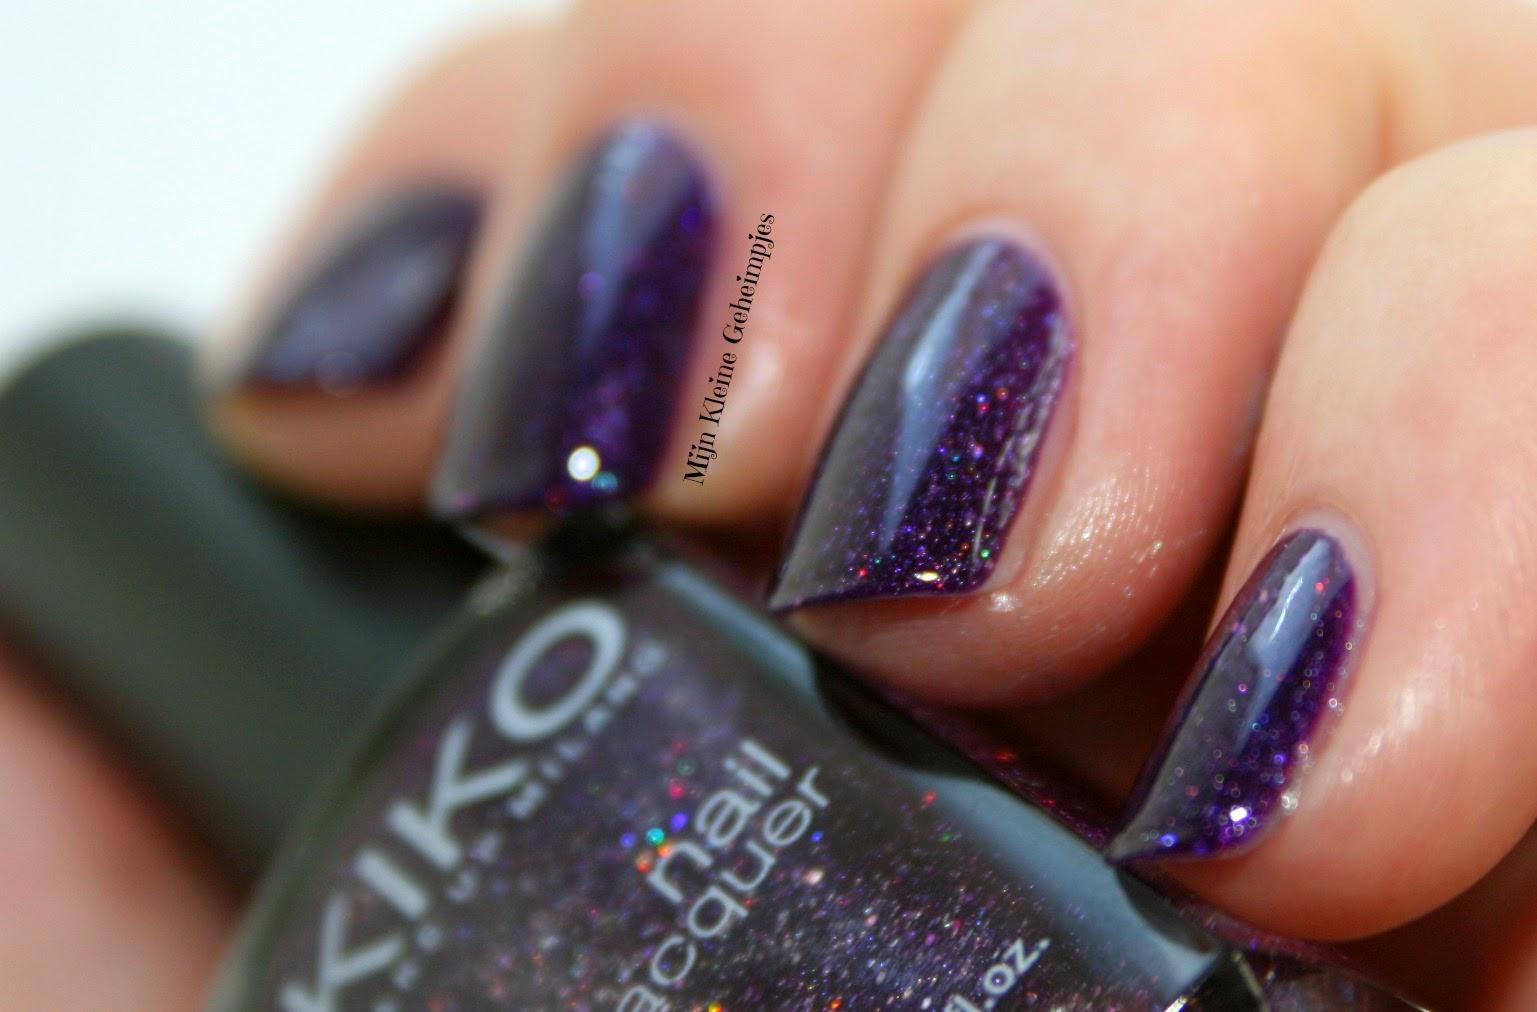 Kiko 255 Violet Microglitter